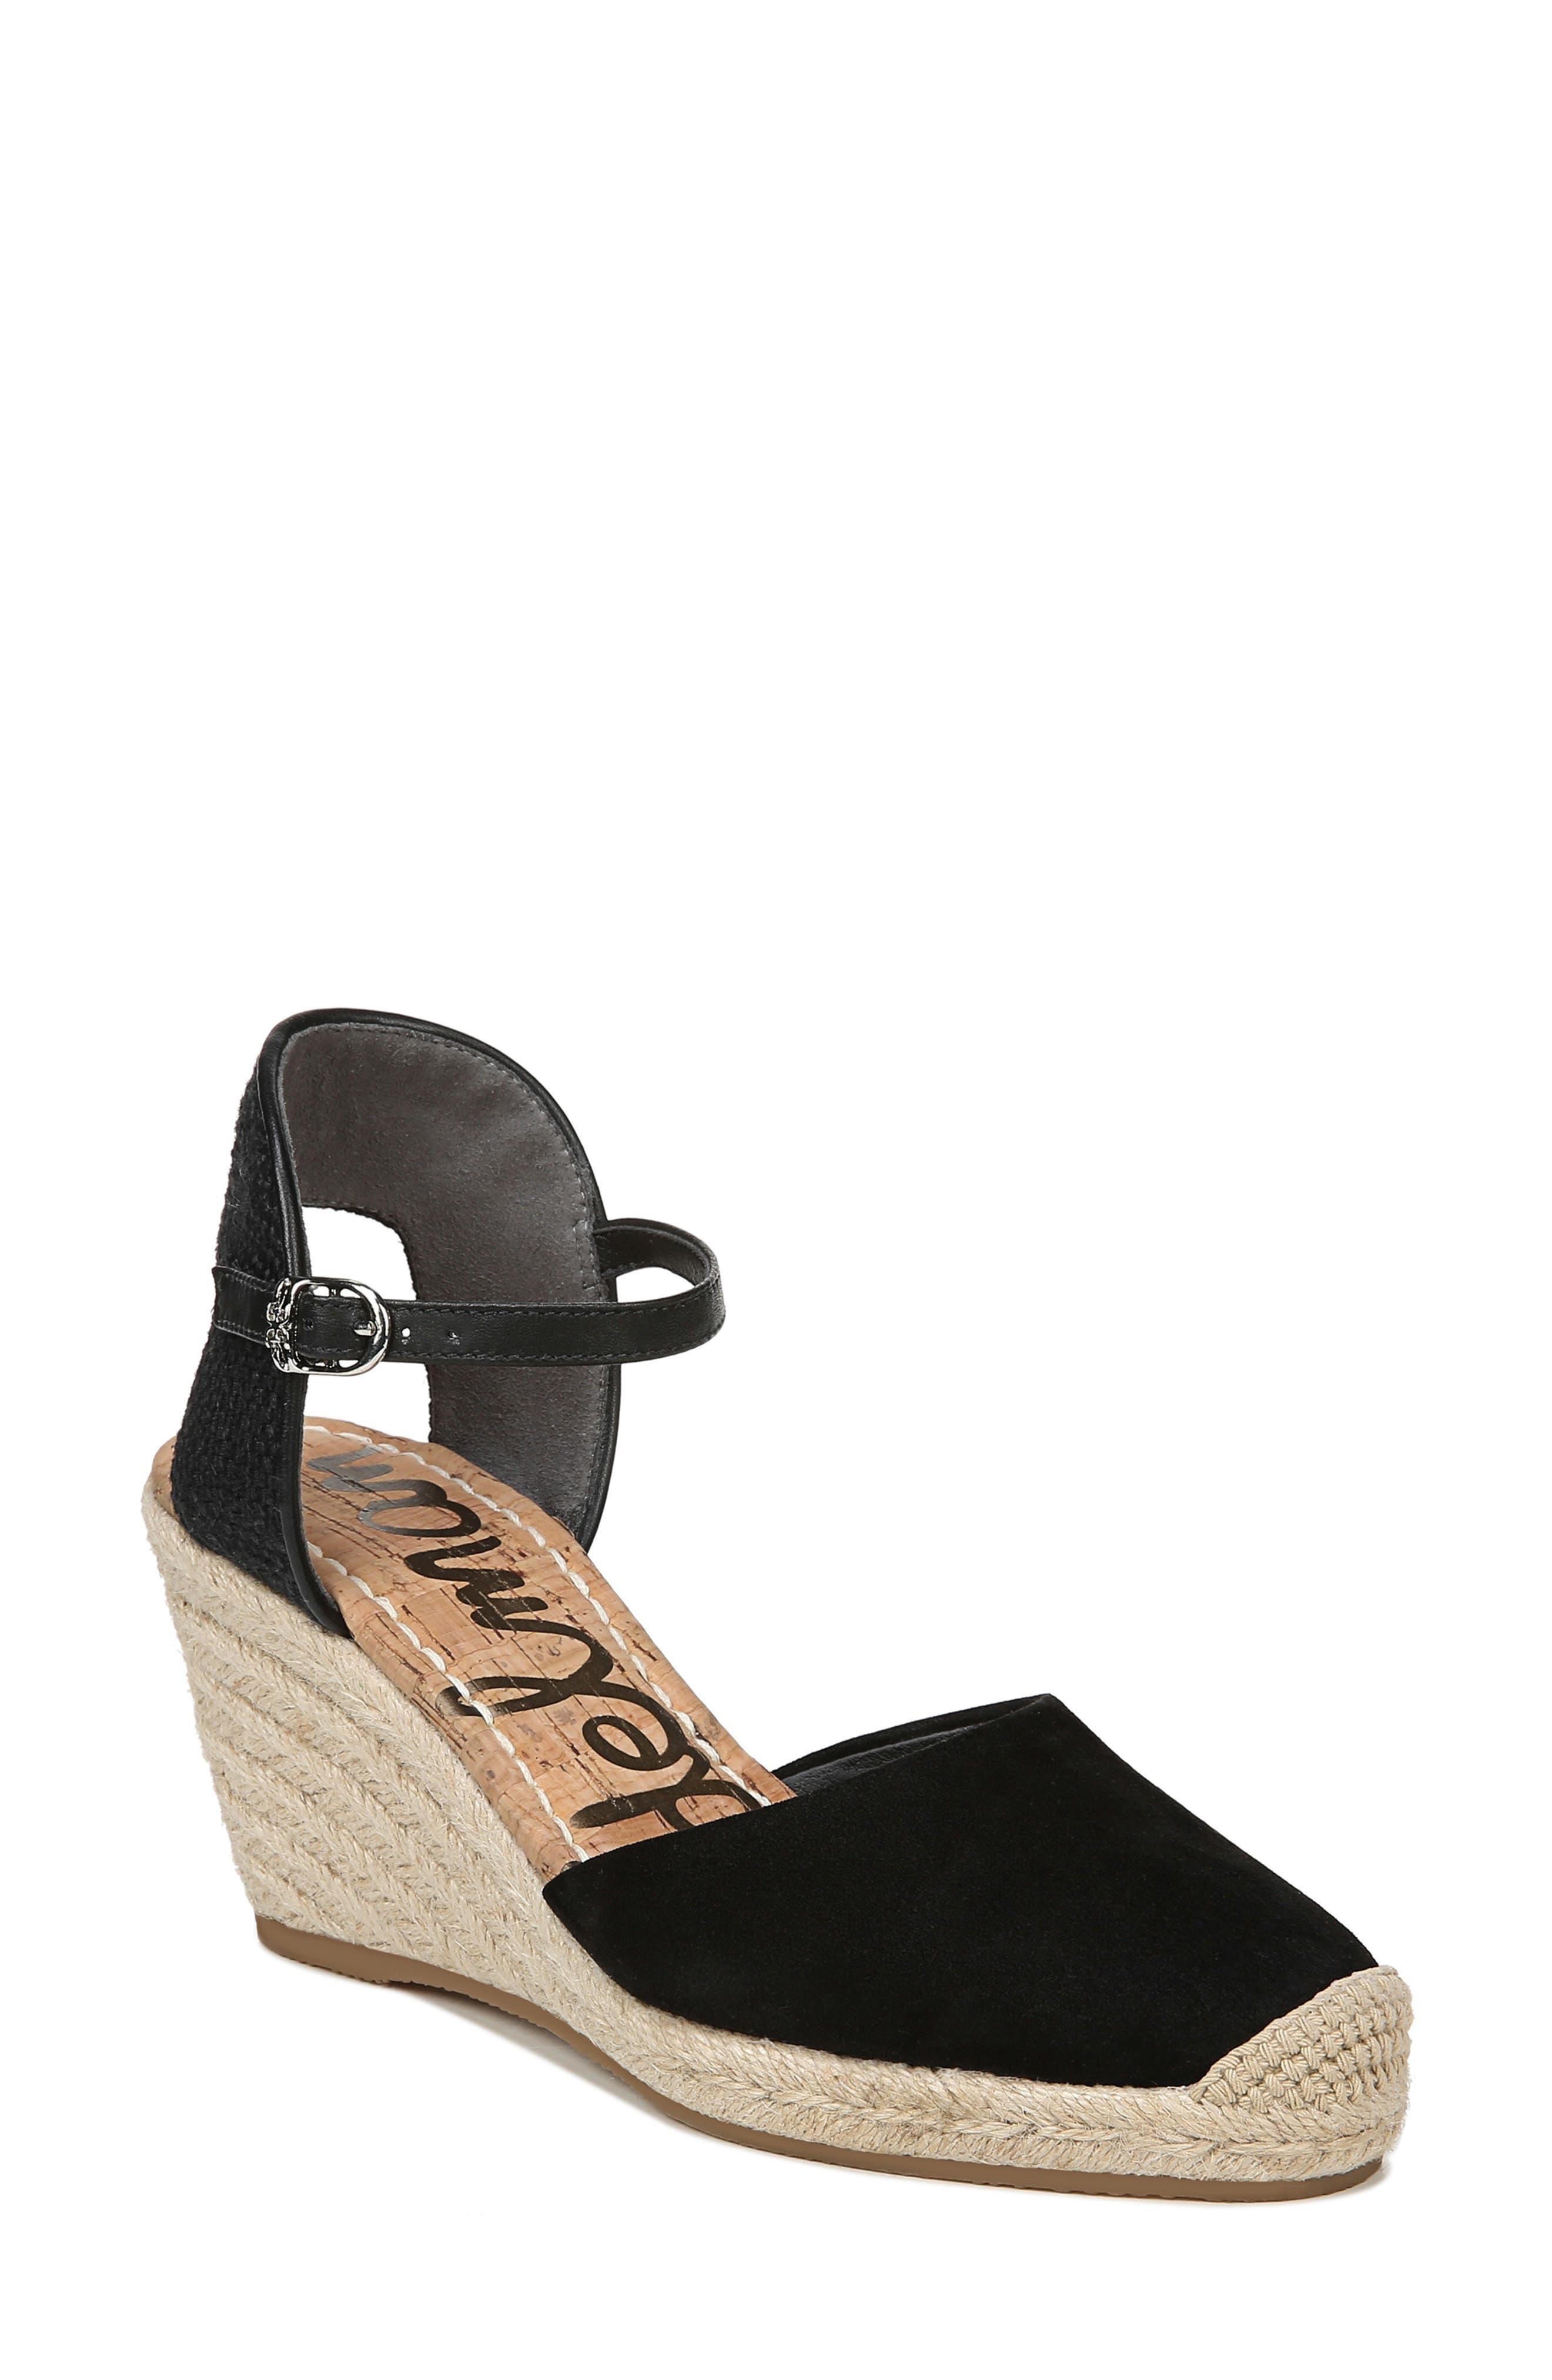 Sam Edelman Payton Wedge Sandal- Black